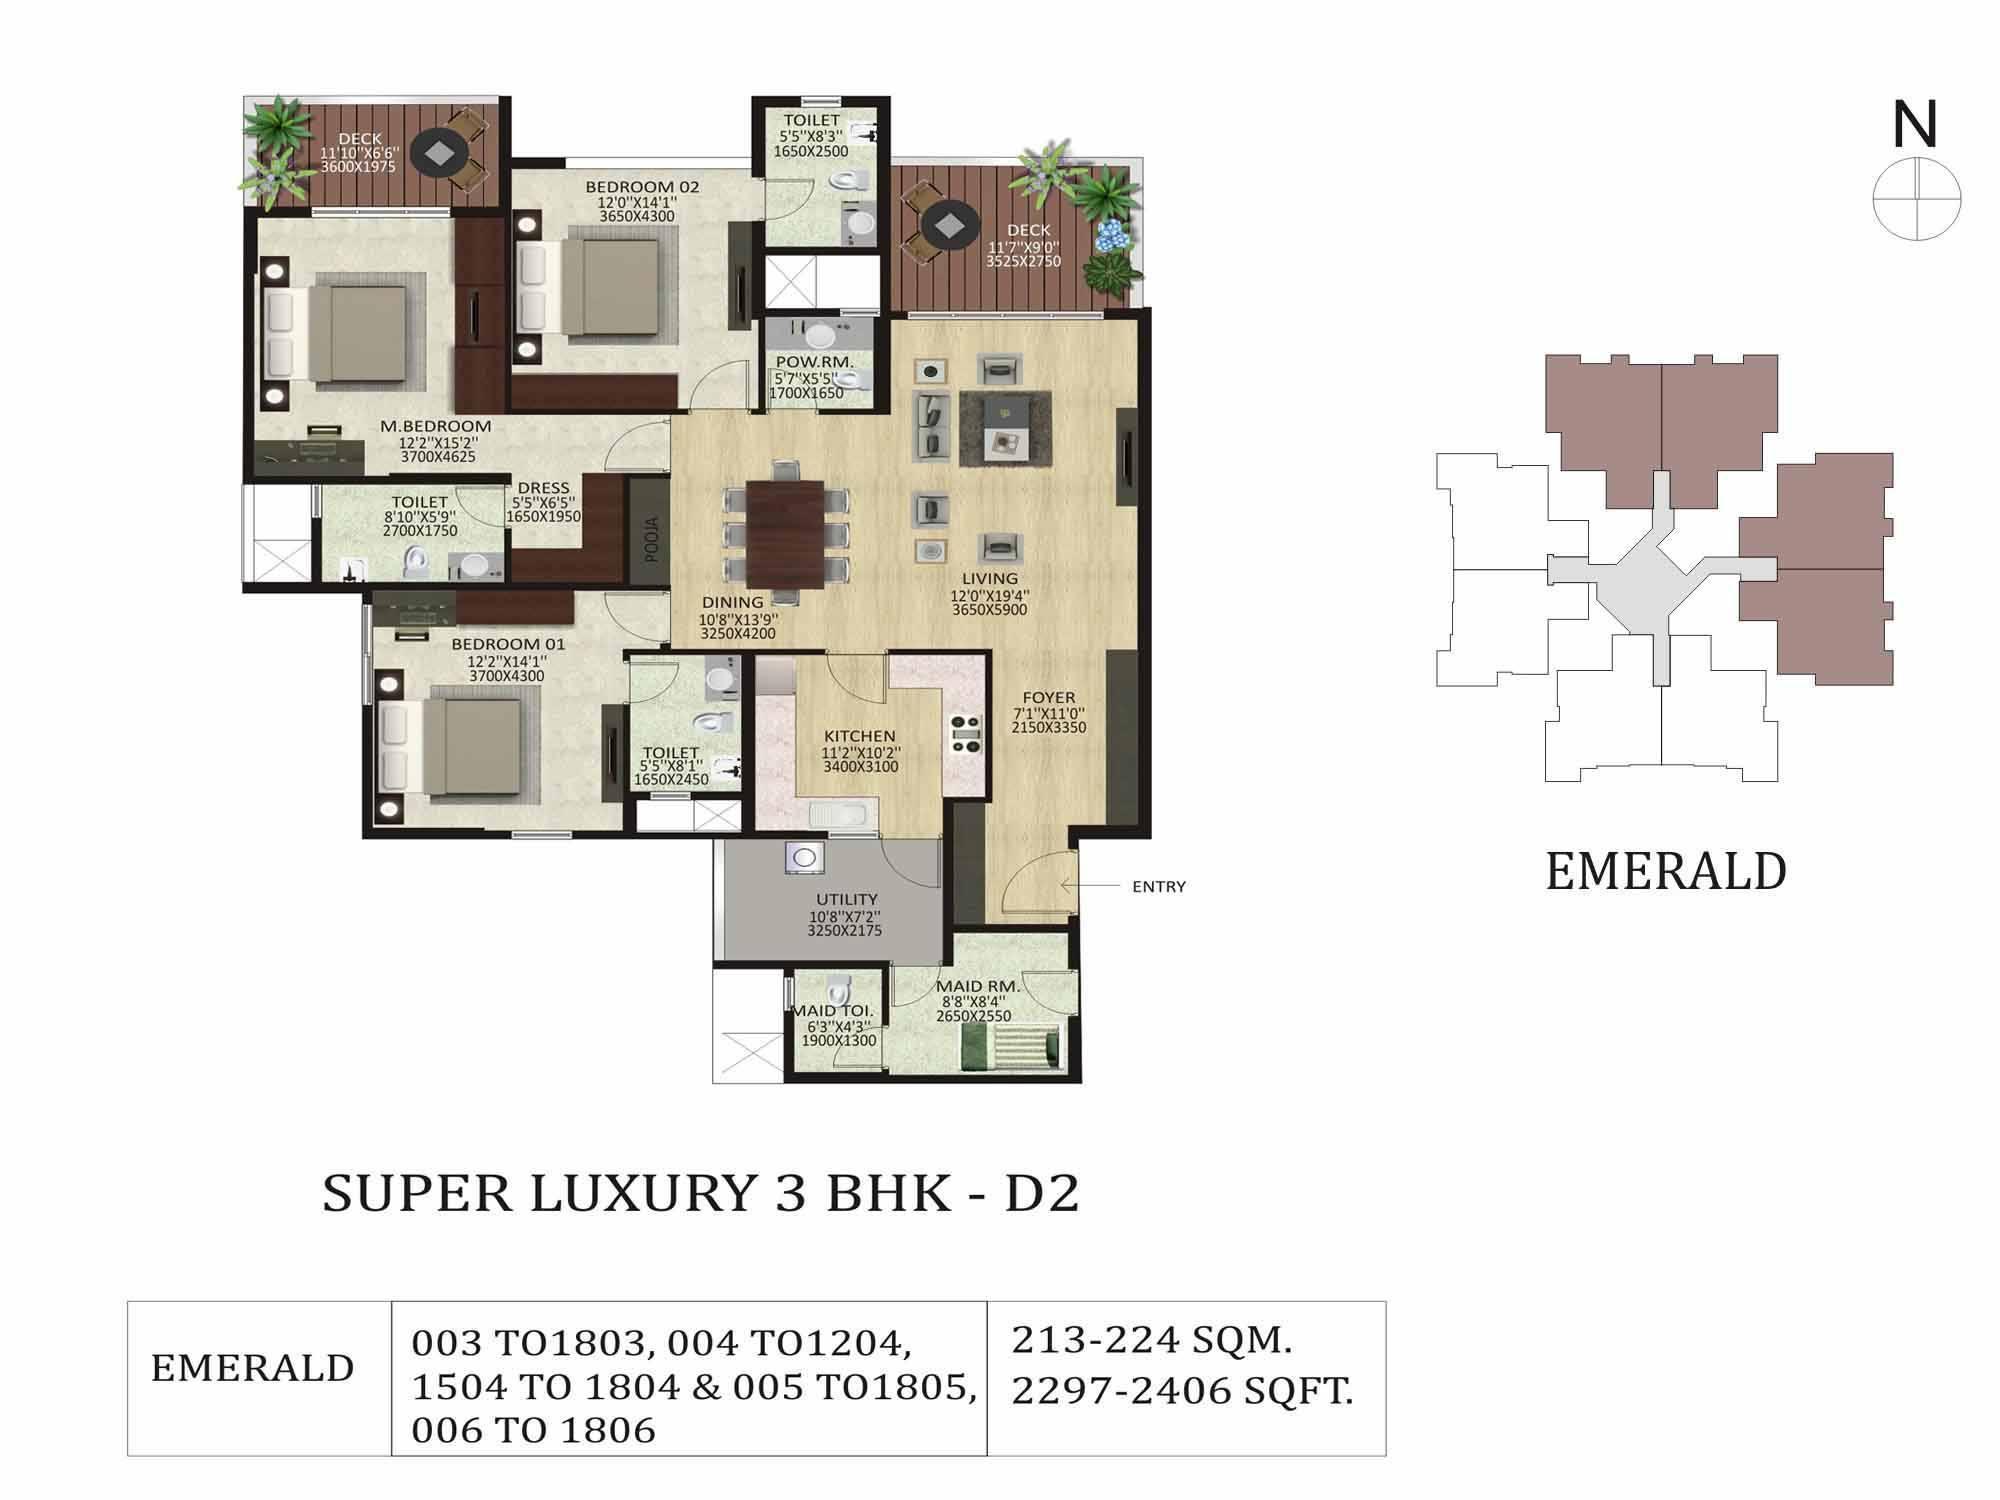 Shapoorji Pallonji ParkWest 2 & 3 Bedroom Apartments Bangalore